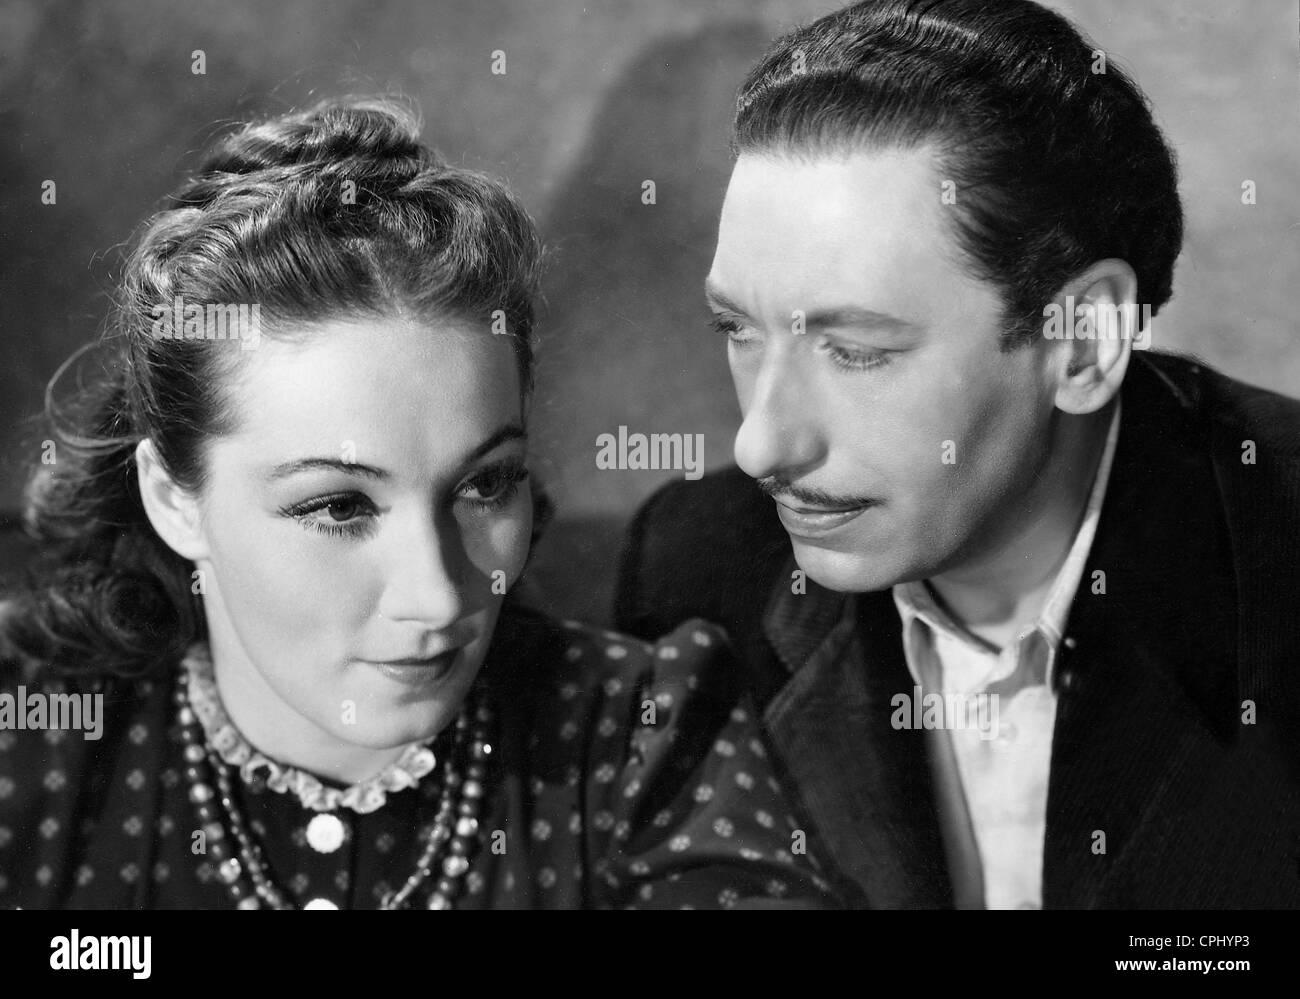 Brigitte Horney and Willy Birgel in 'Enemies', 1940 - Stock Image